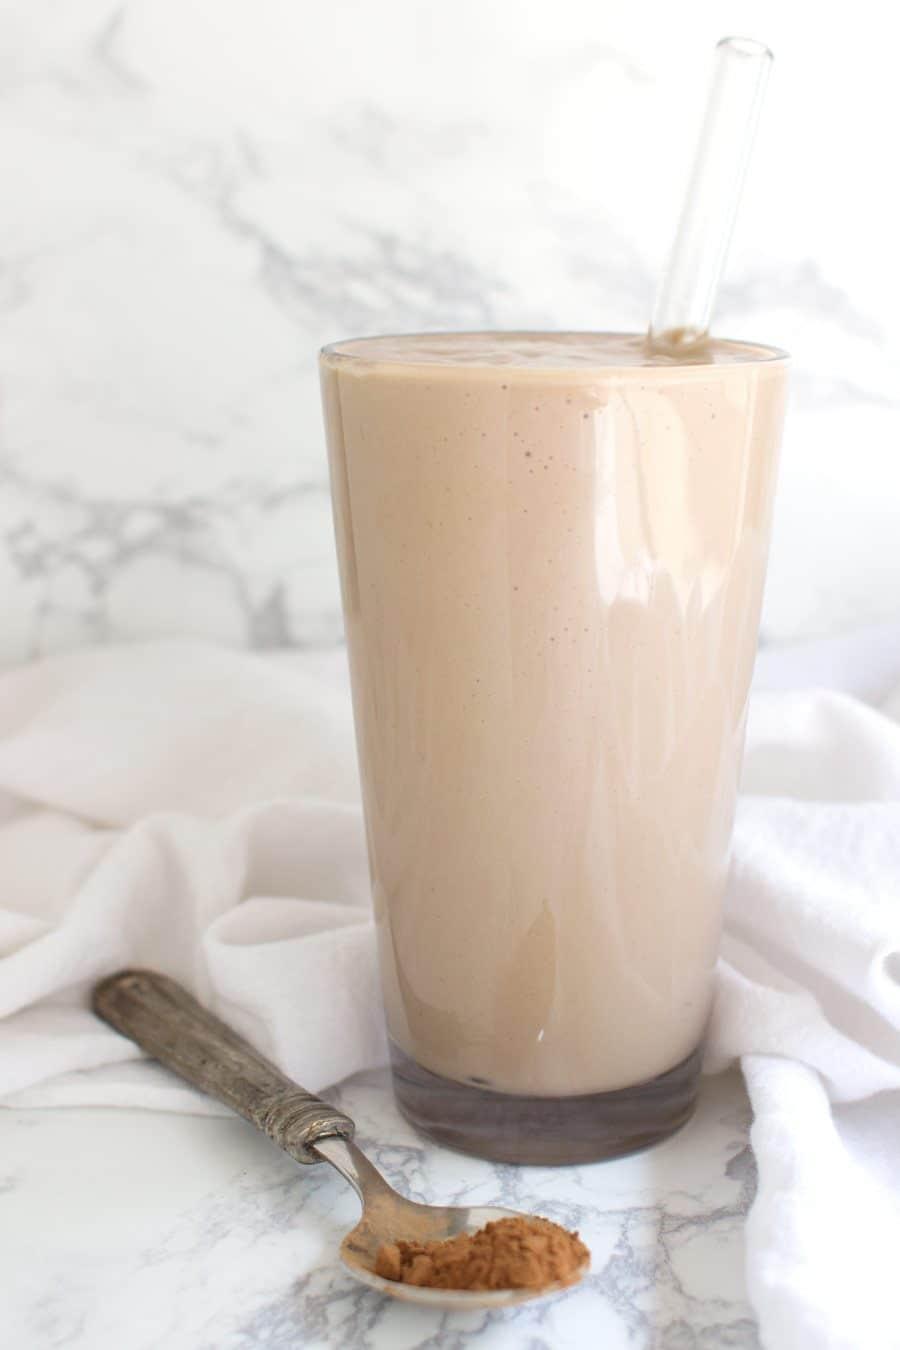 Chocolate Shake recipe from acleanplate.com #aip #paleo #autoimmuneprotocol